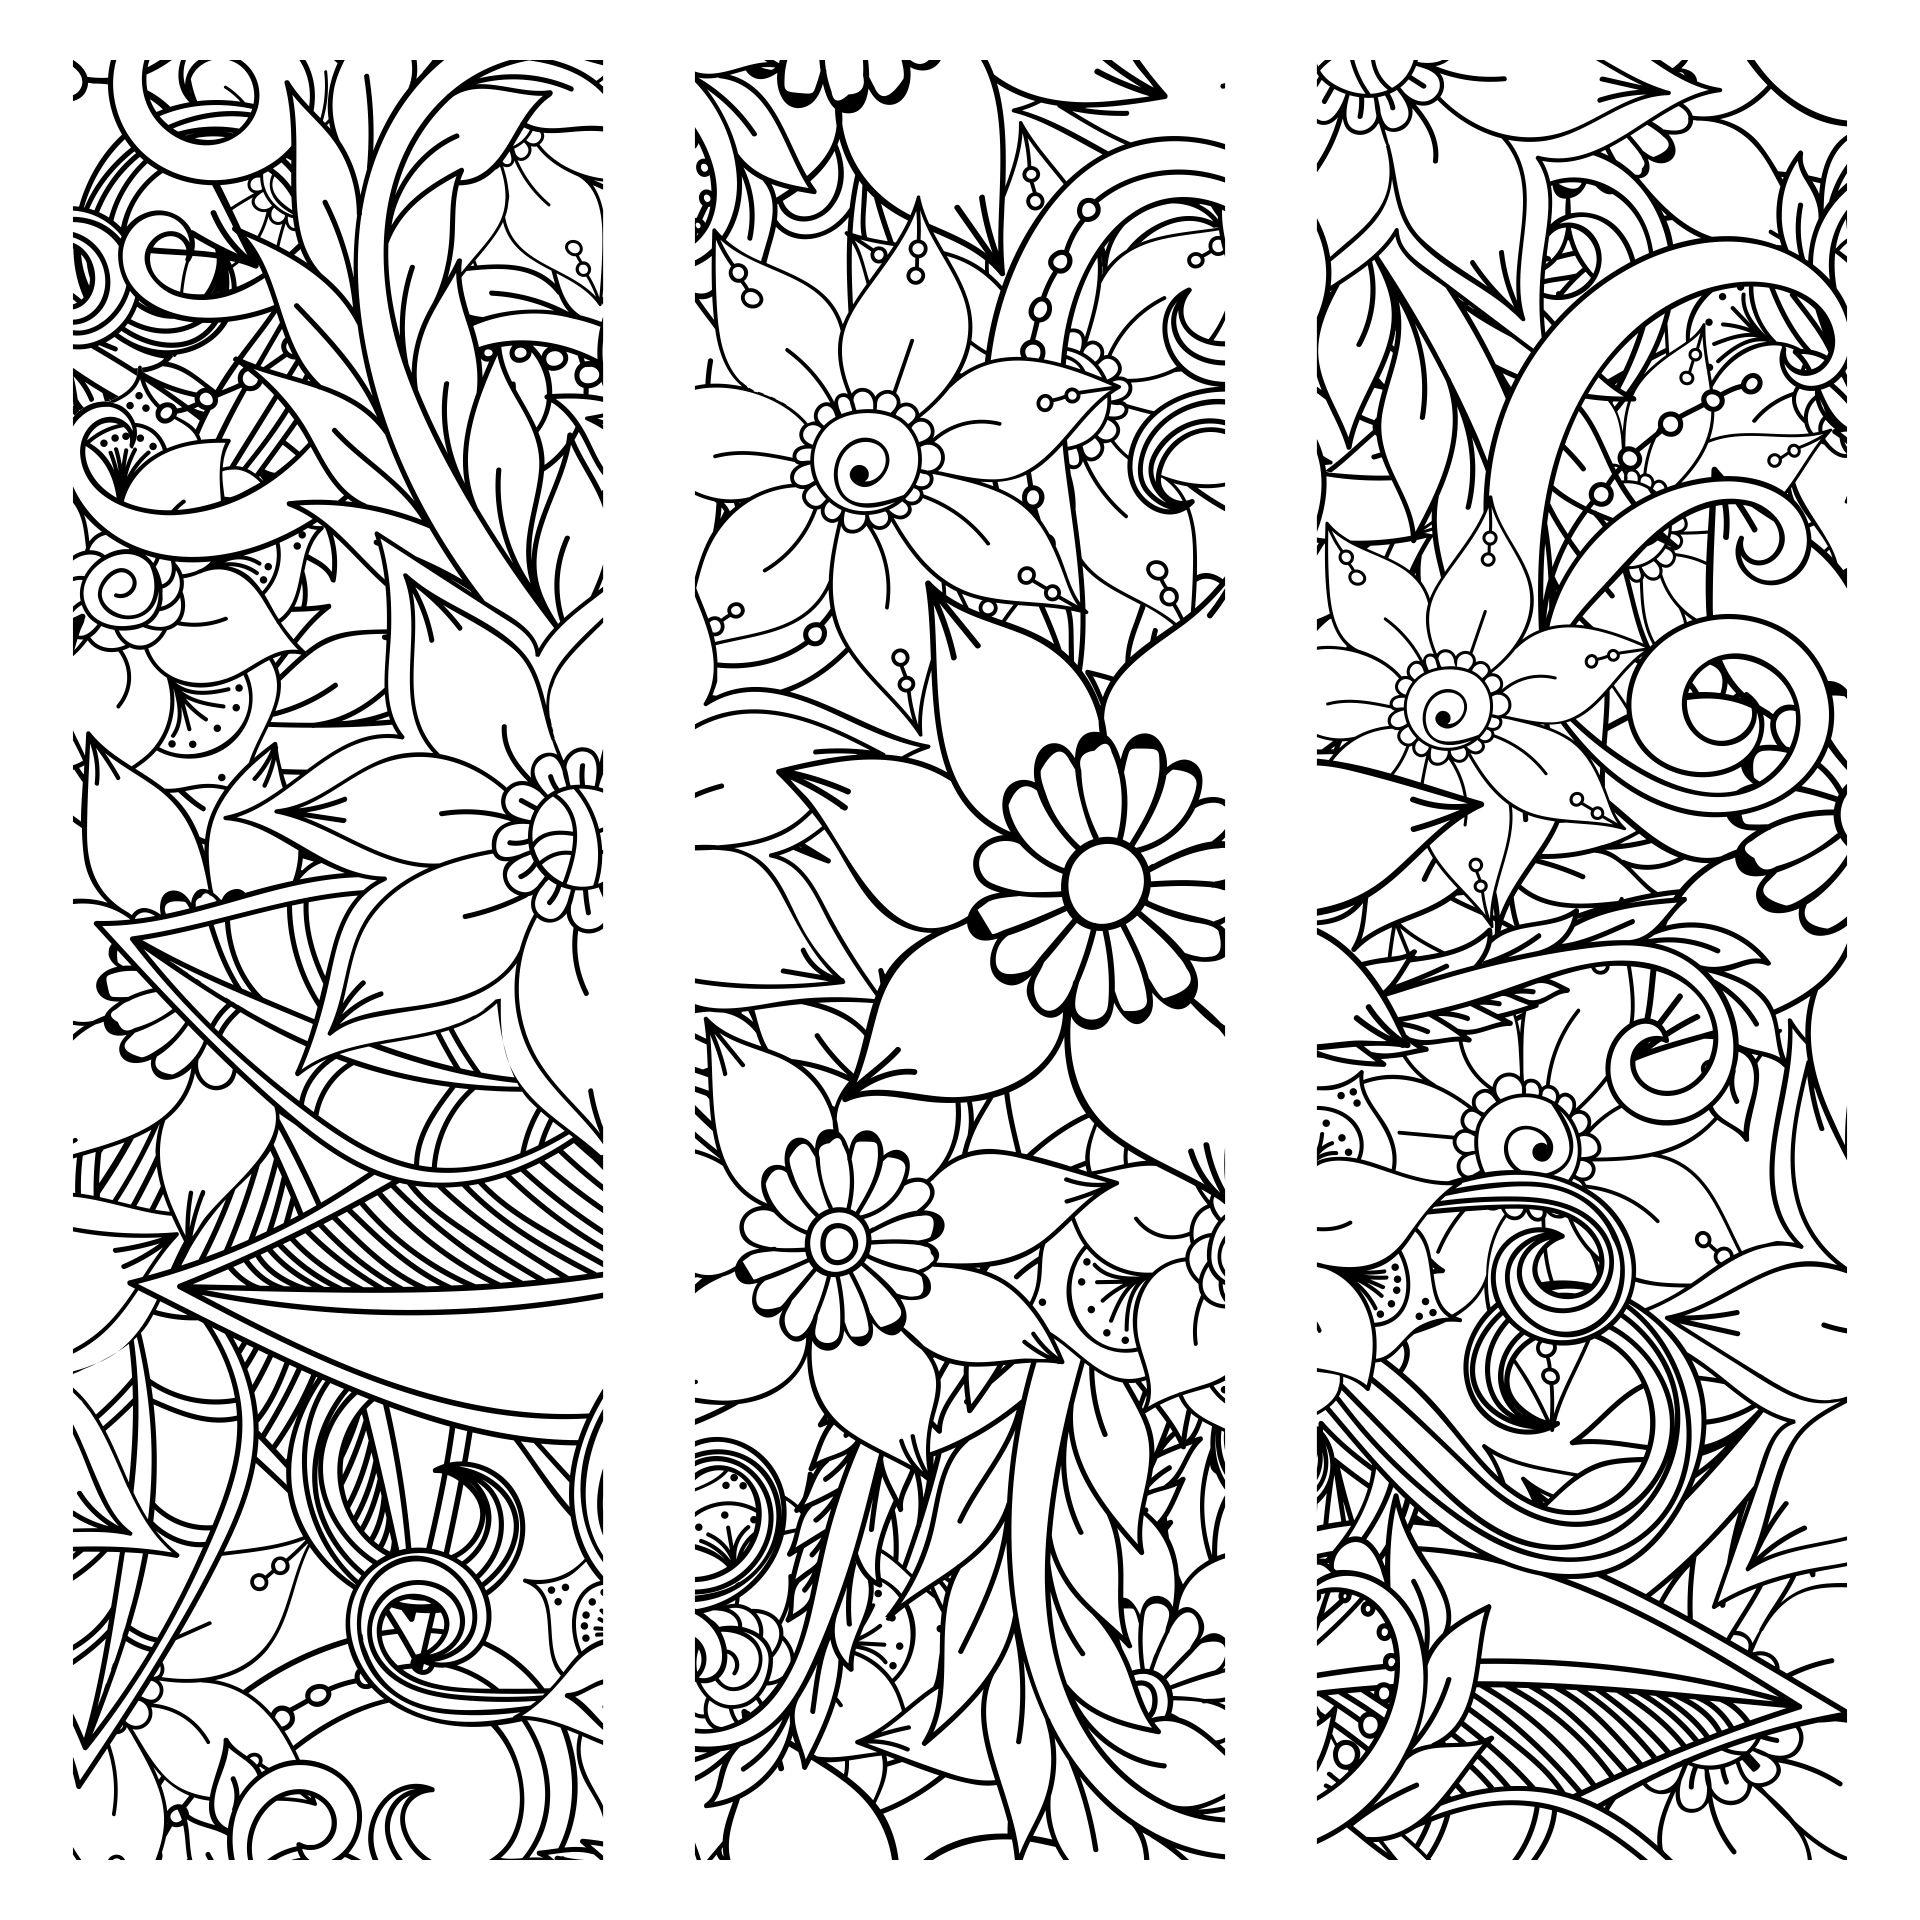 Printable Zentangle Templates